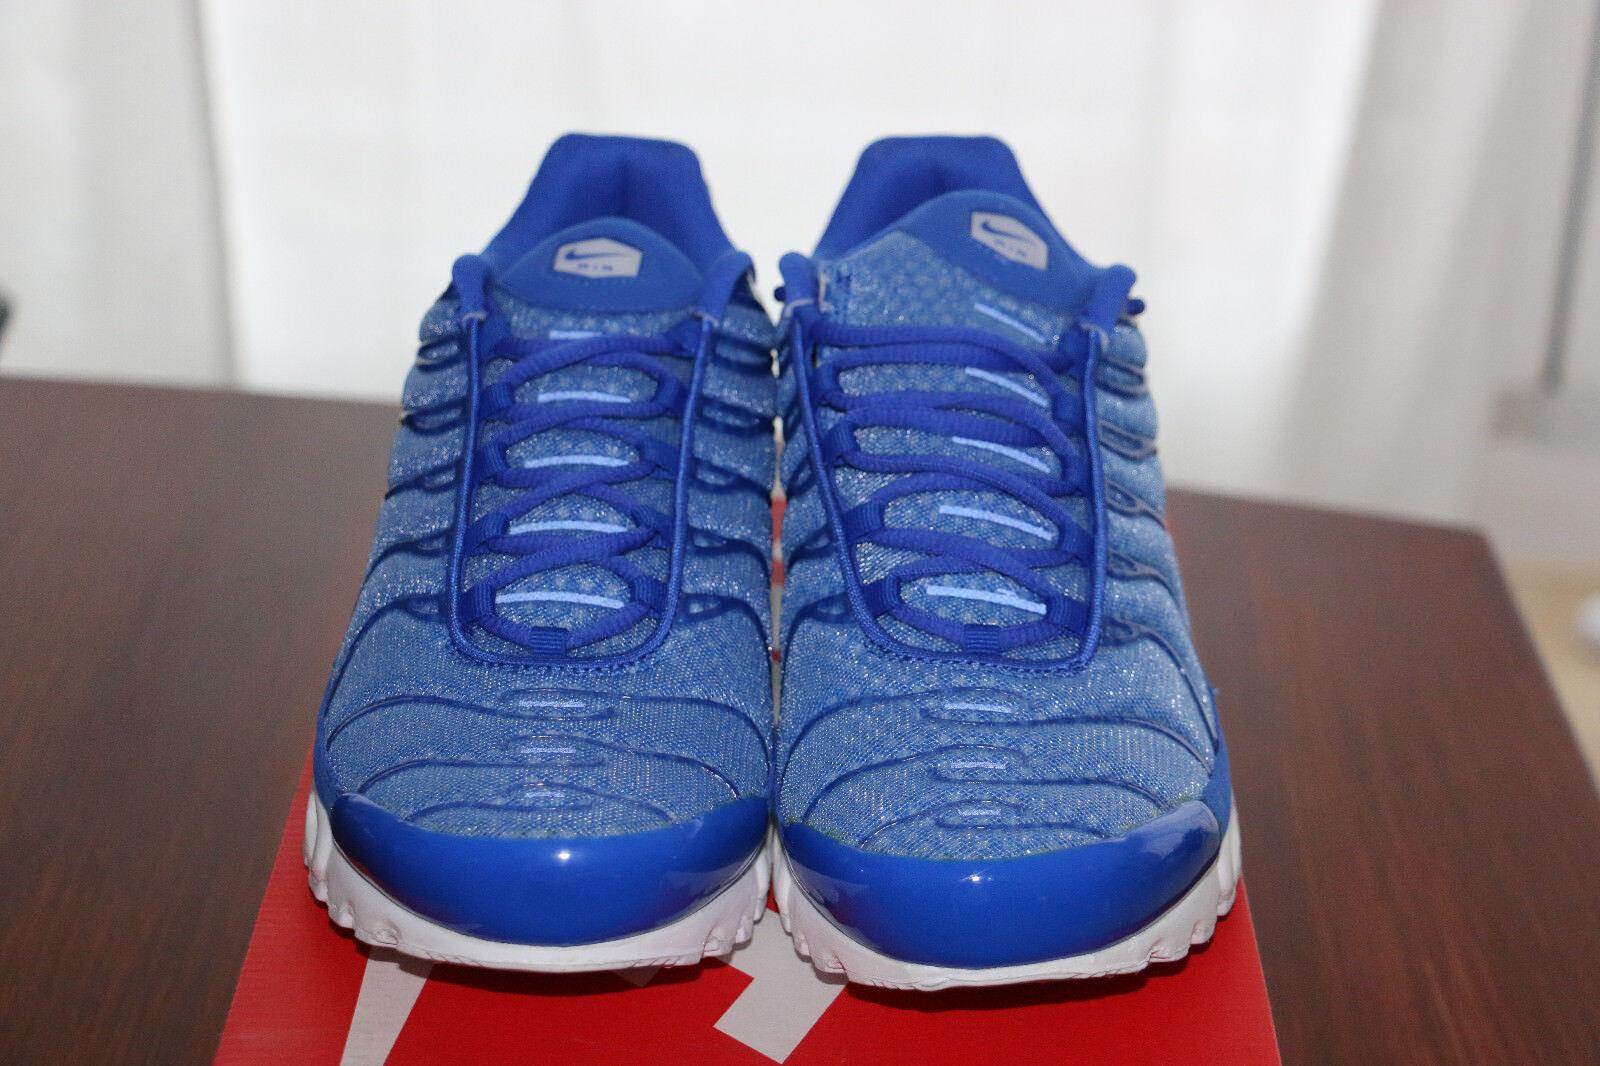 Nike Air Max TN Plus US 11 Racer Blau Weiß TXT